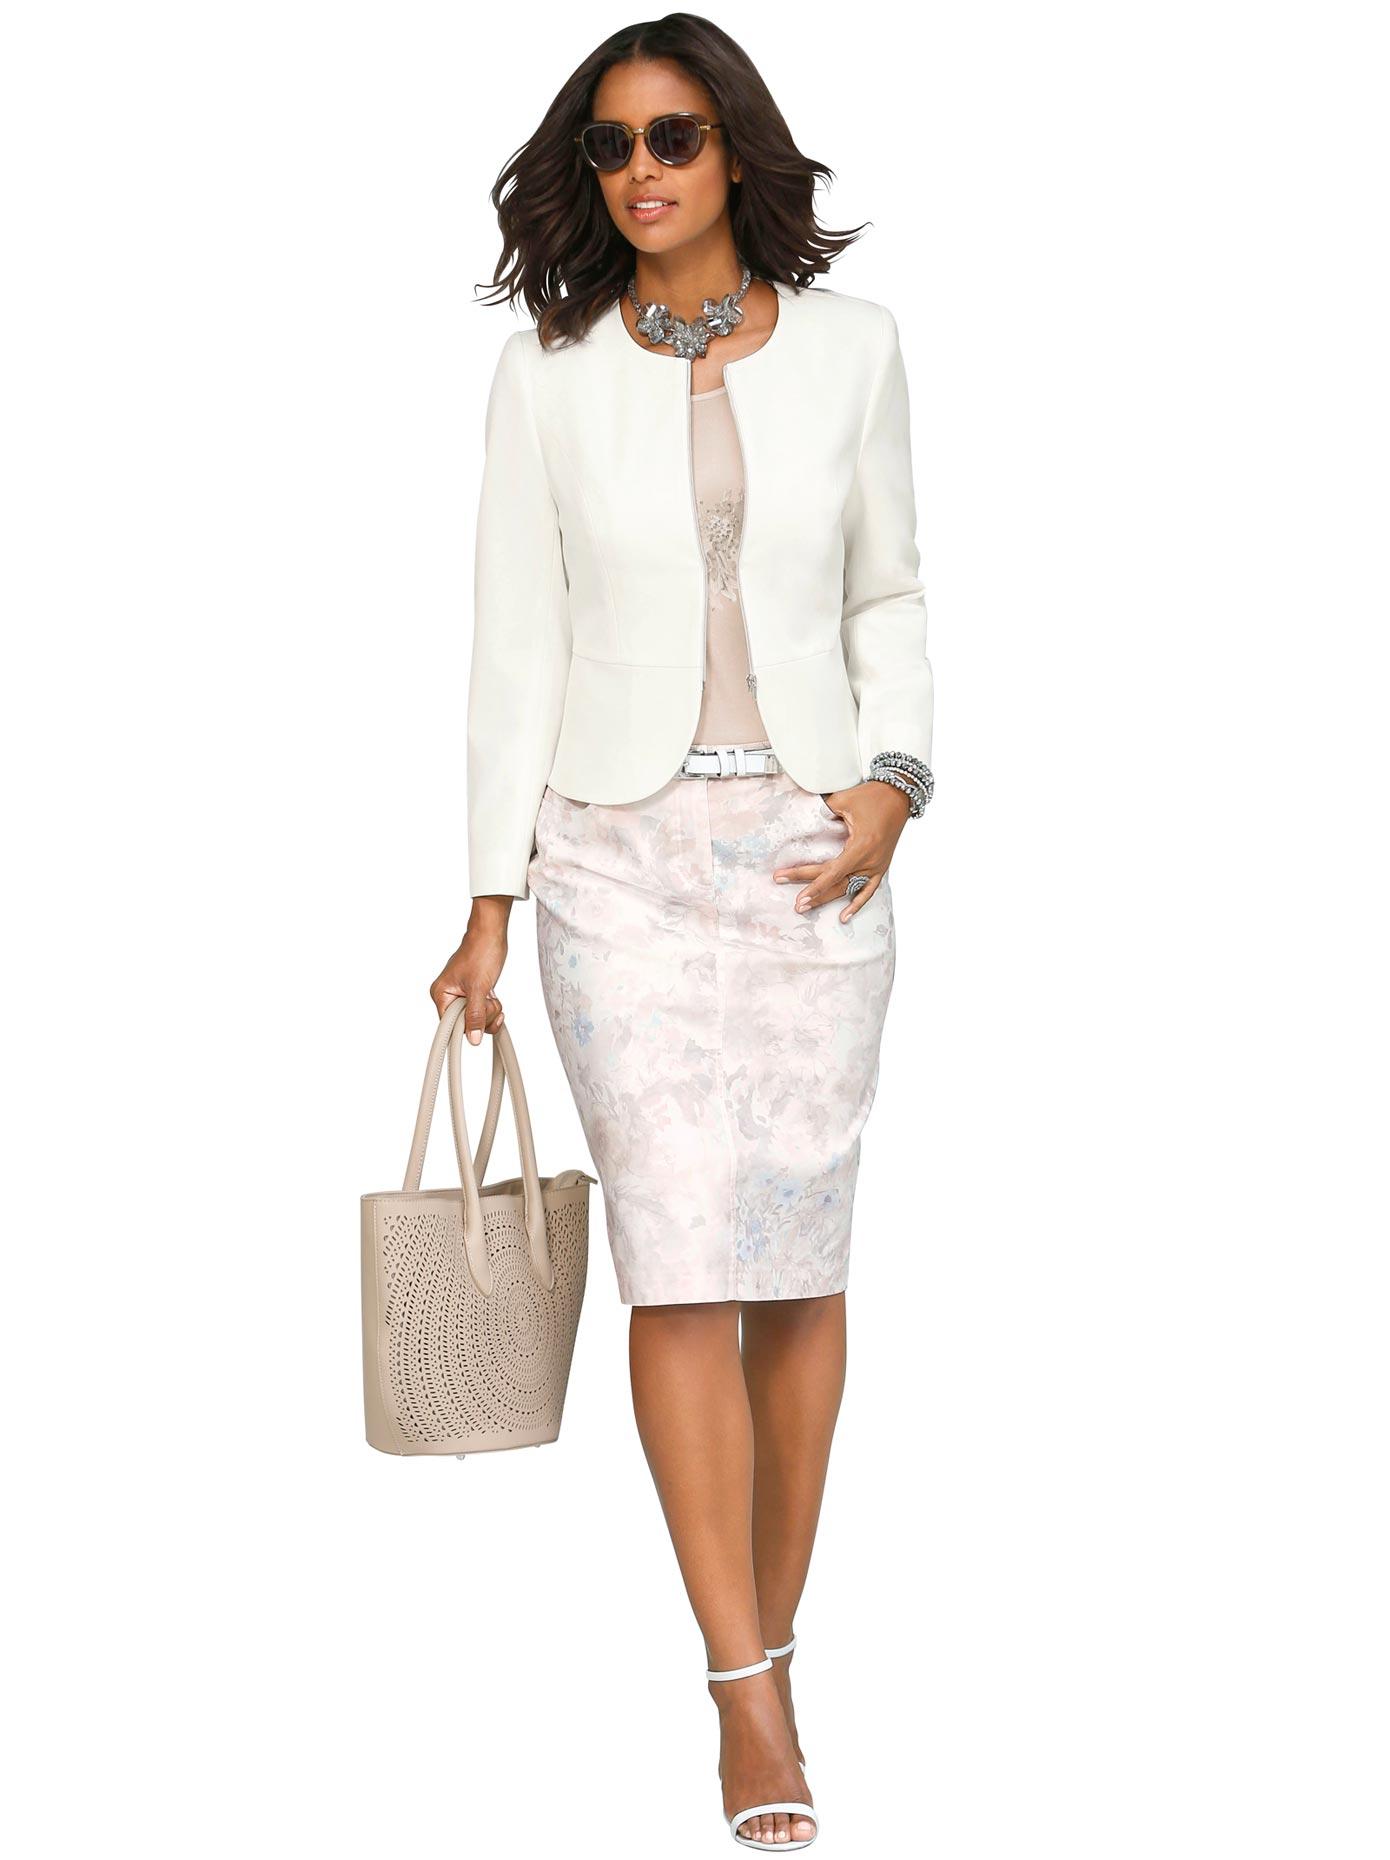 Image of Alessa W. Blazer in femininer Passform